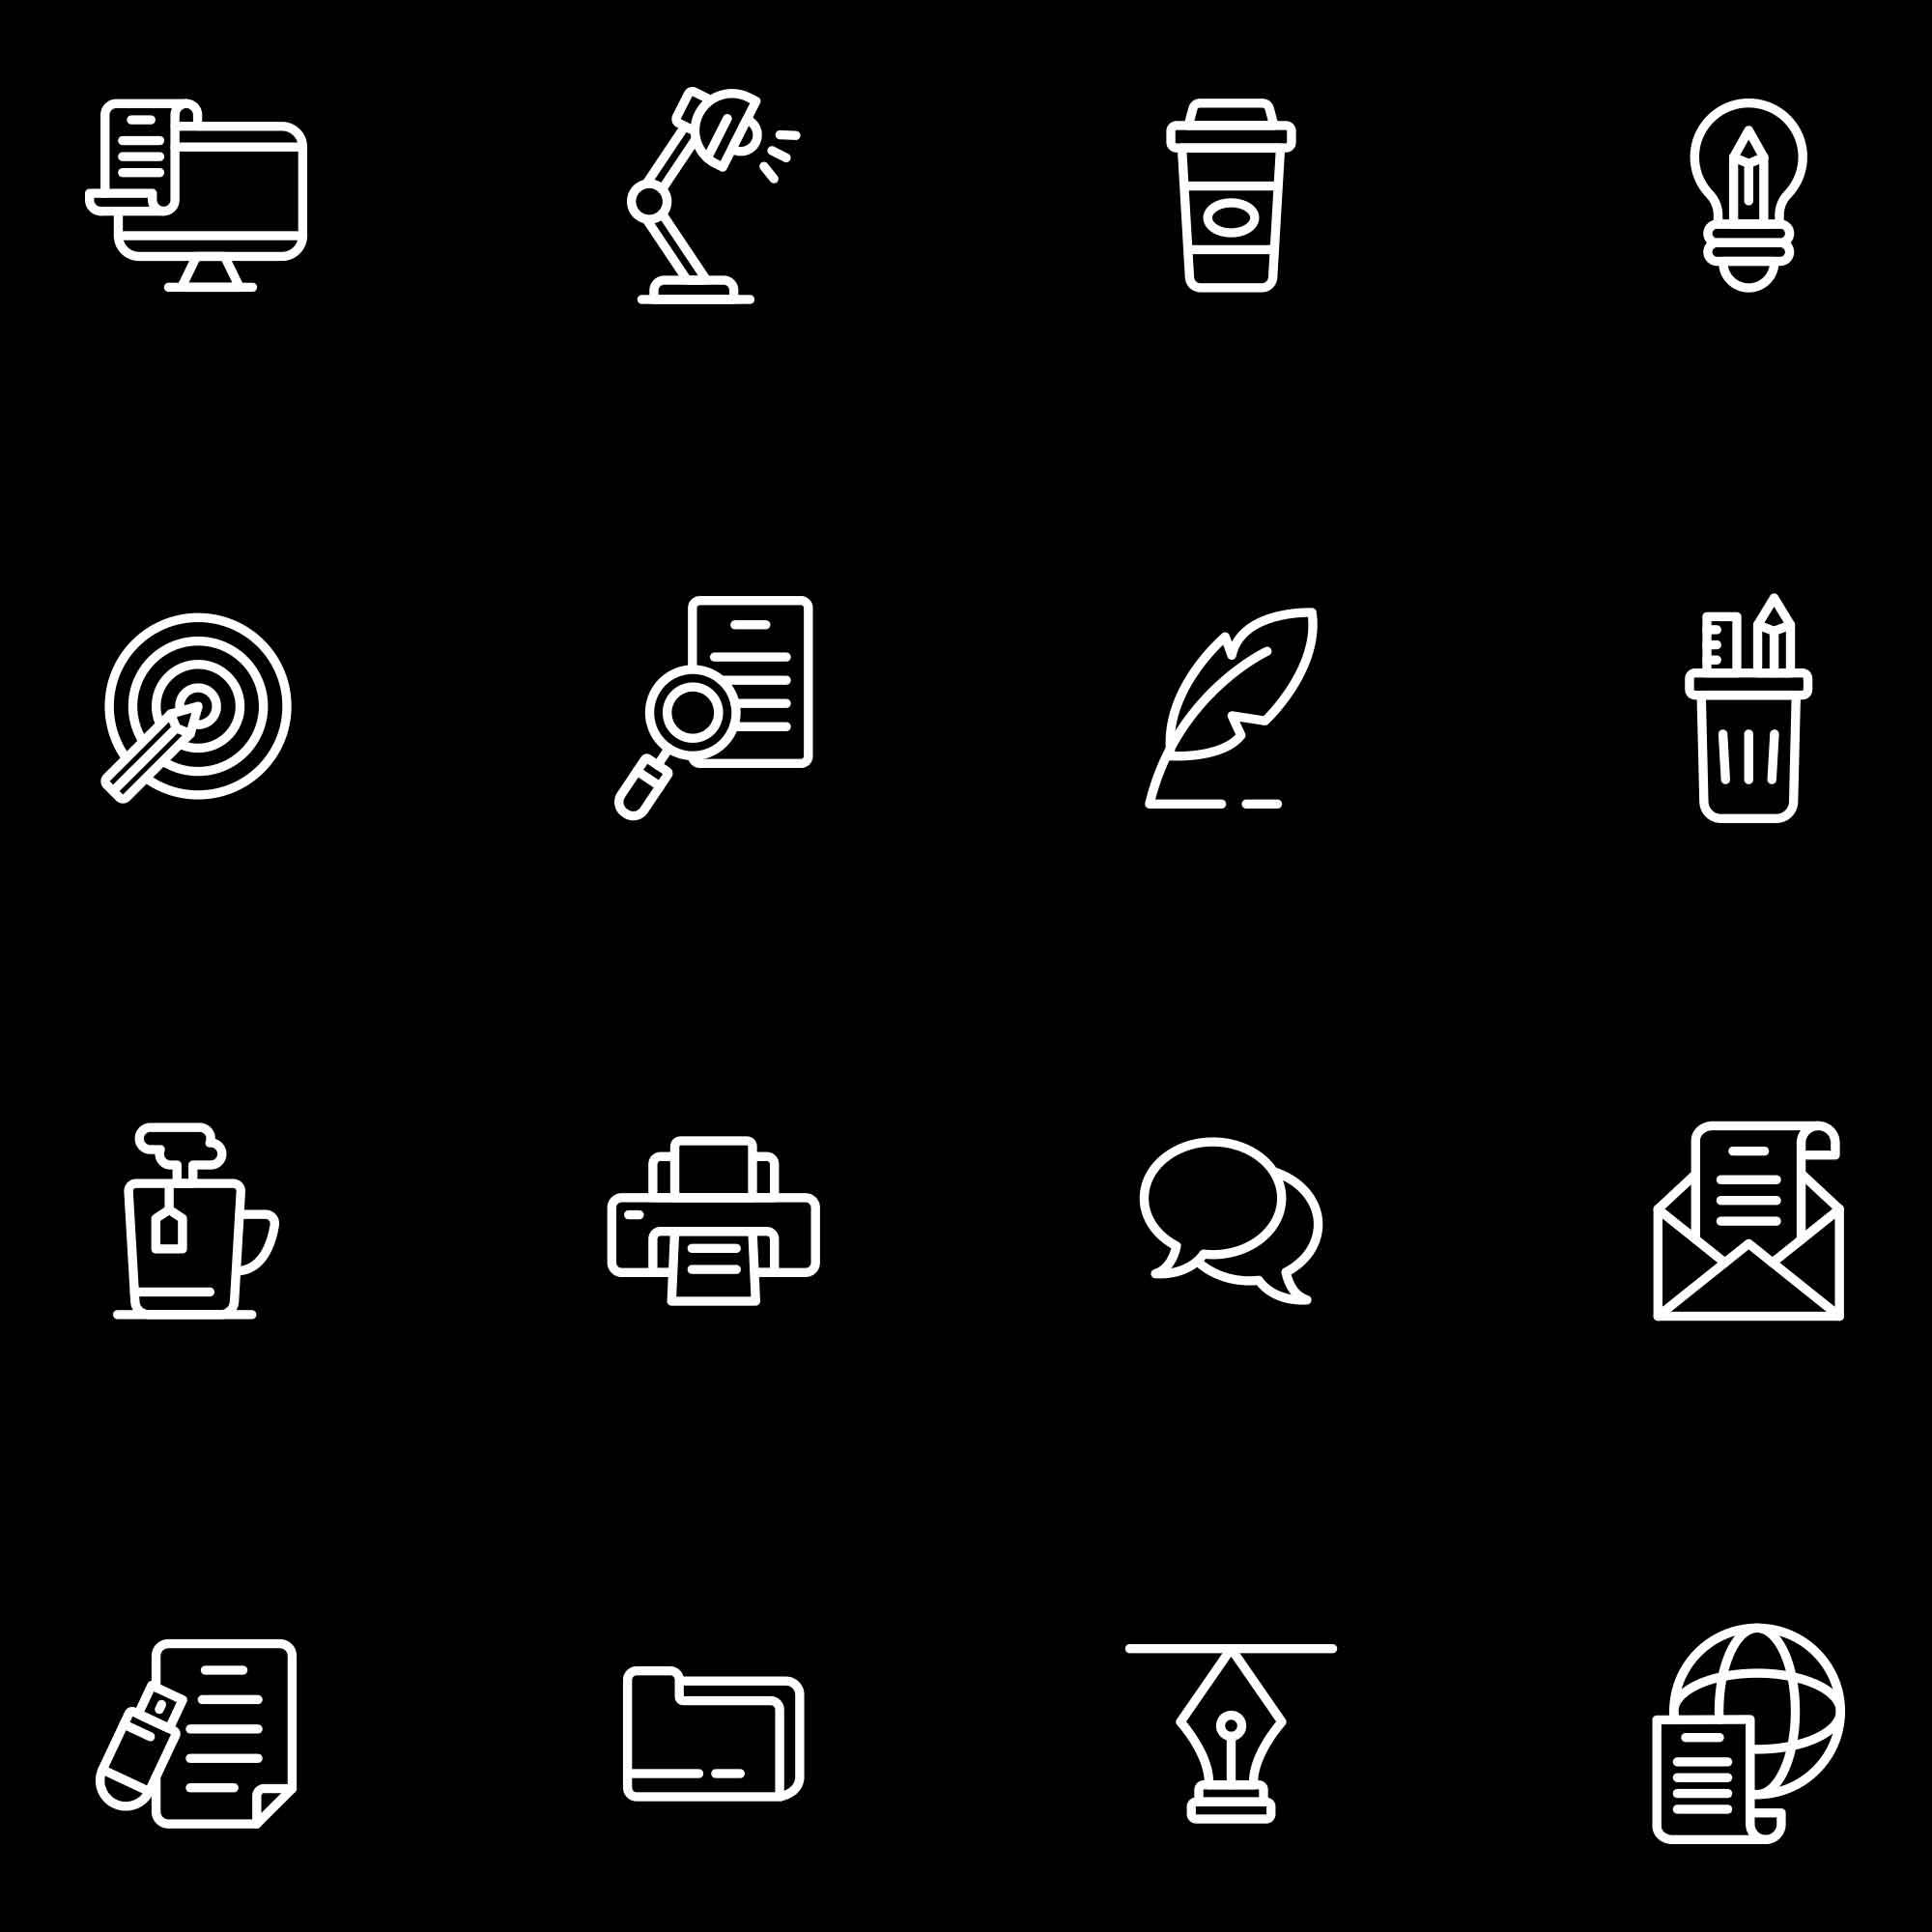 Copywriting Vector Icons Dark